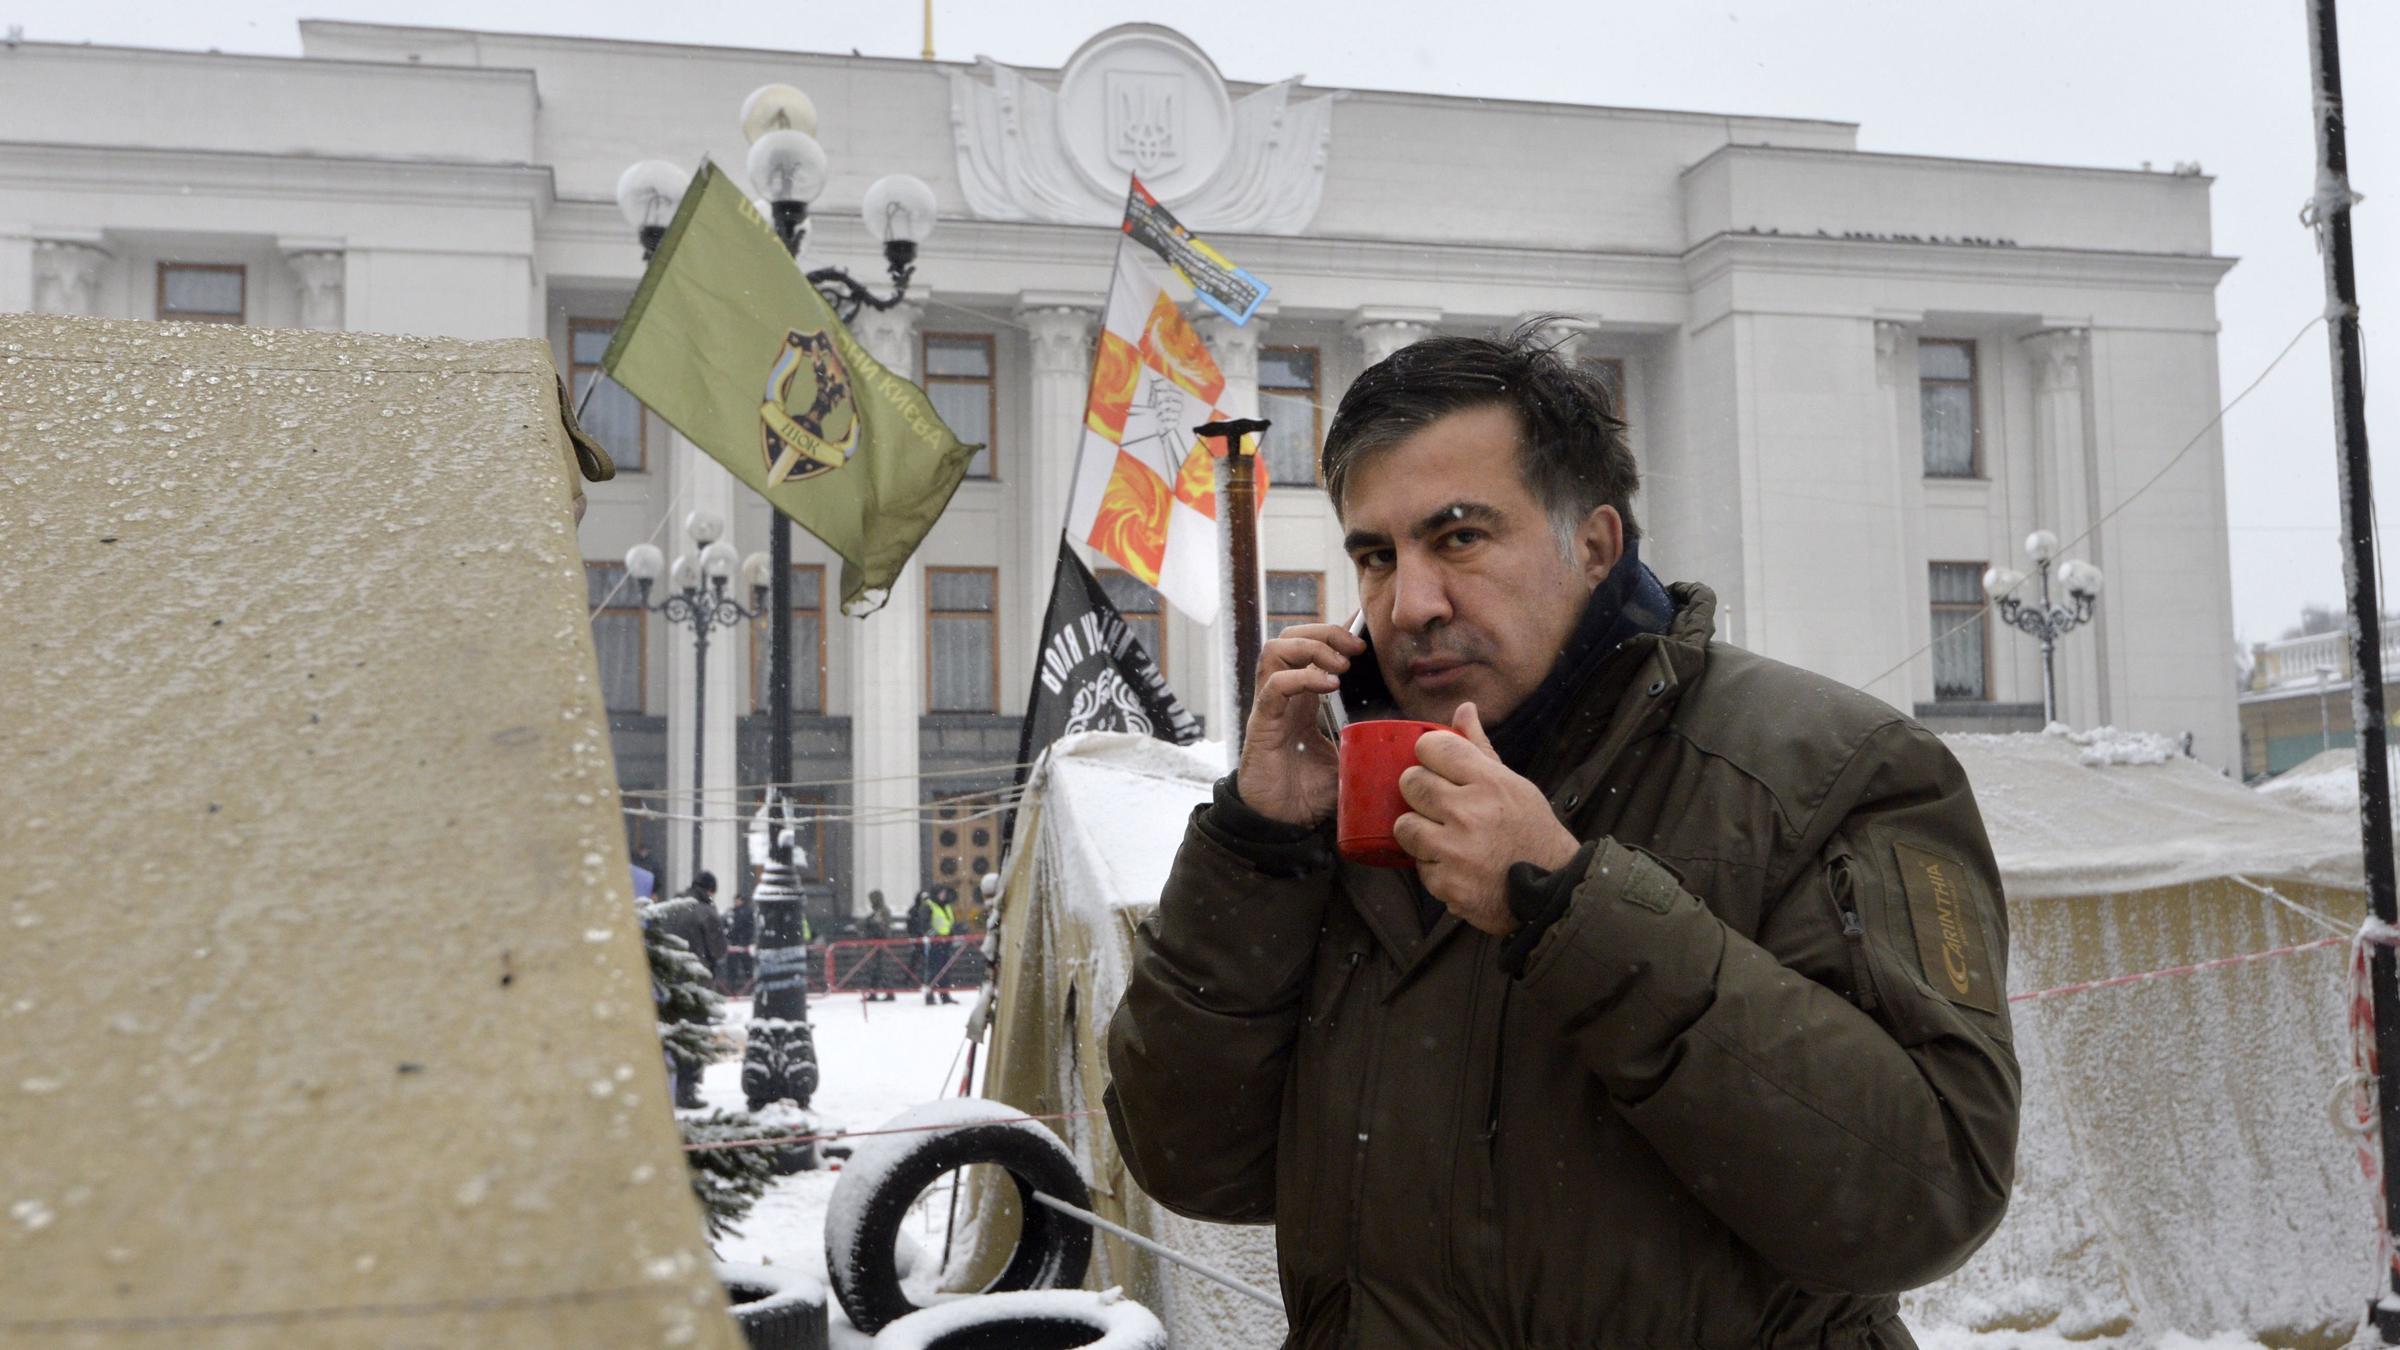 Saakashvili refuses to give himself up in Ukraine